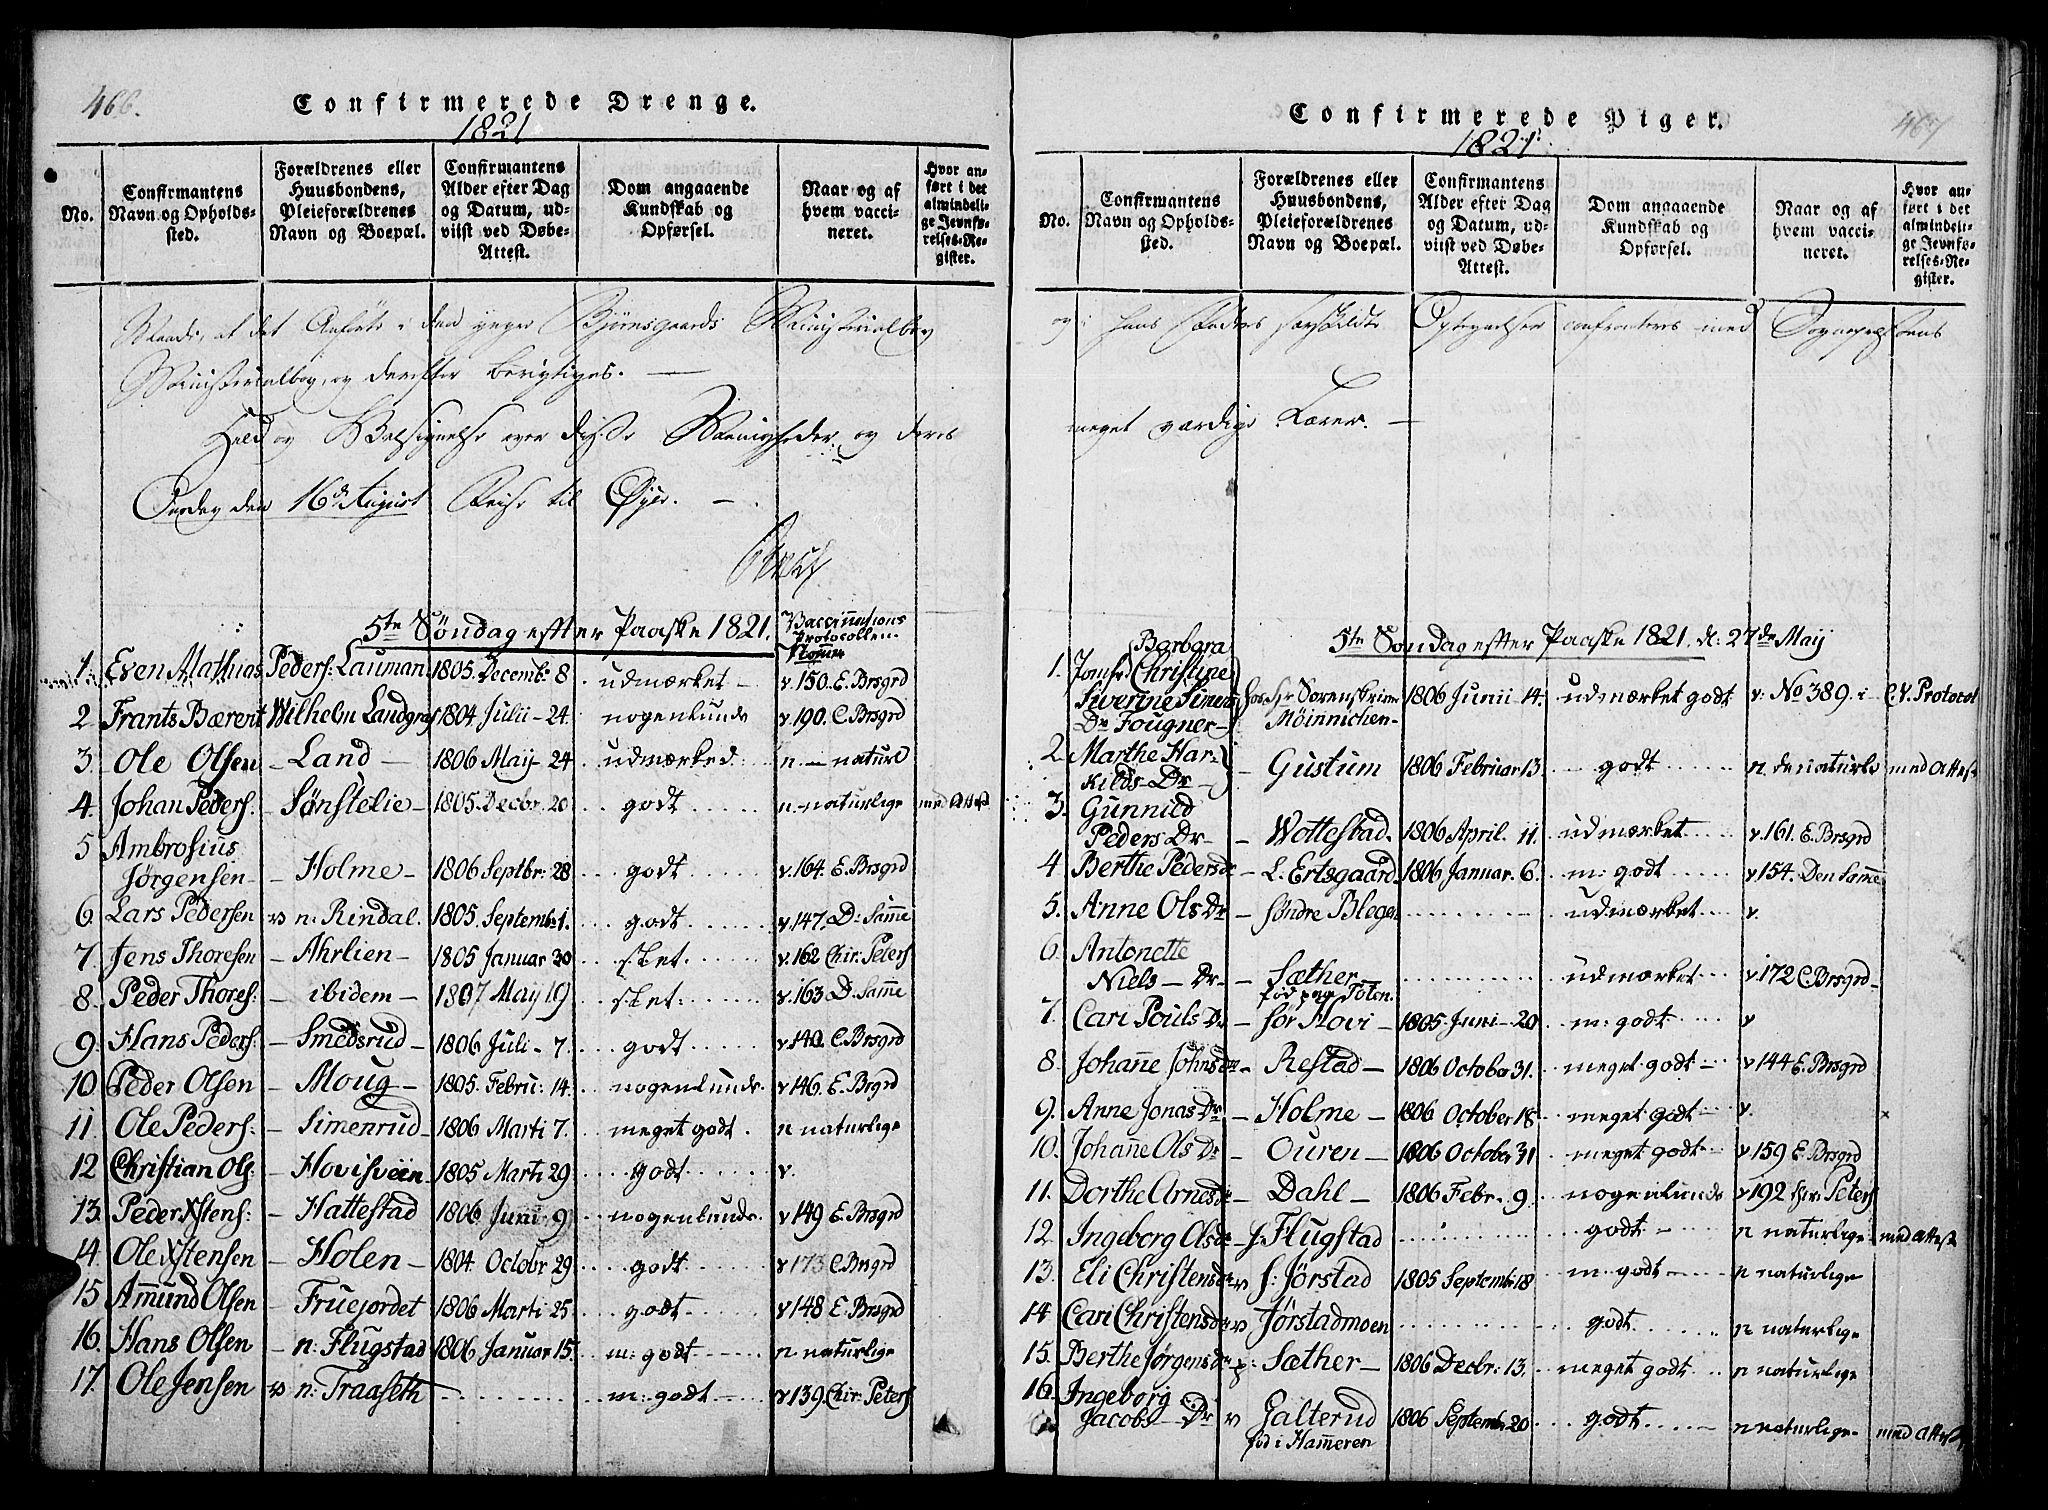 SAH, Fåberg prestekontor, Ministerialbok nr. 3, 1818-1833, s. 466-467